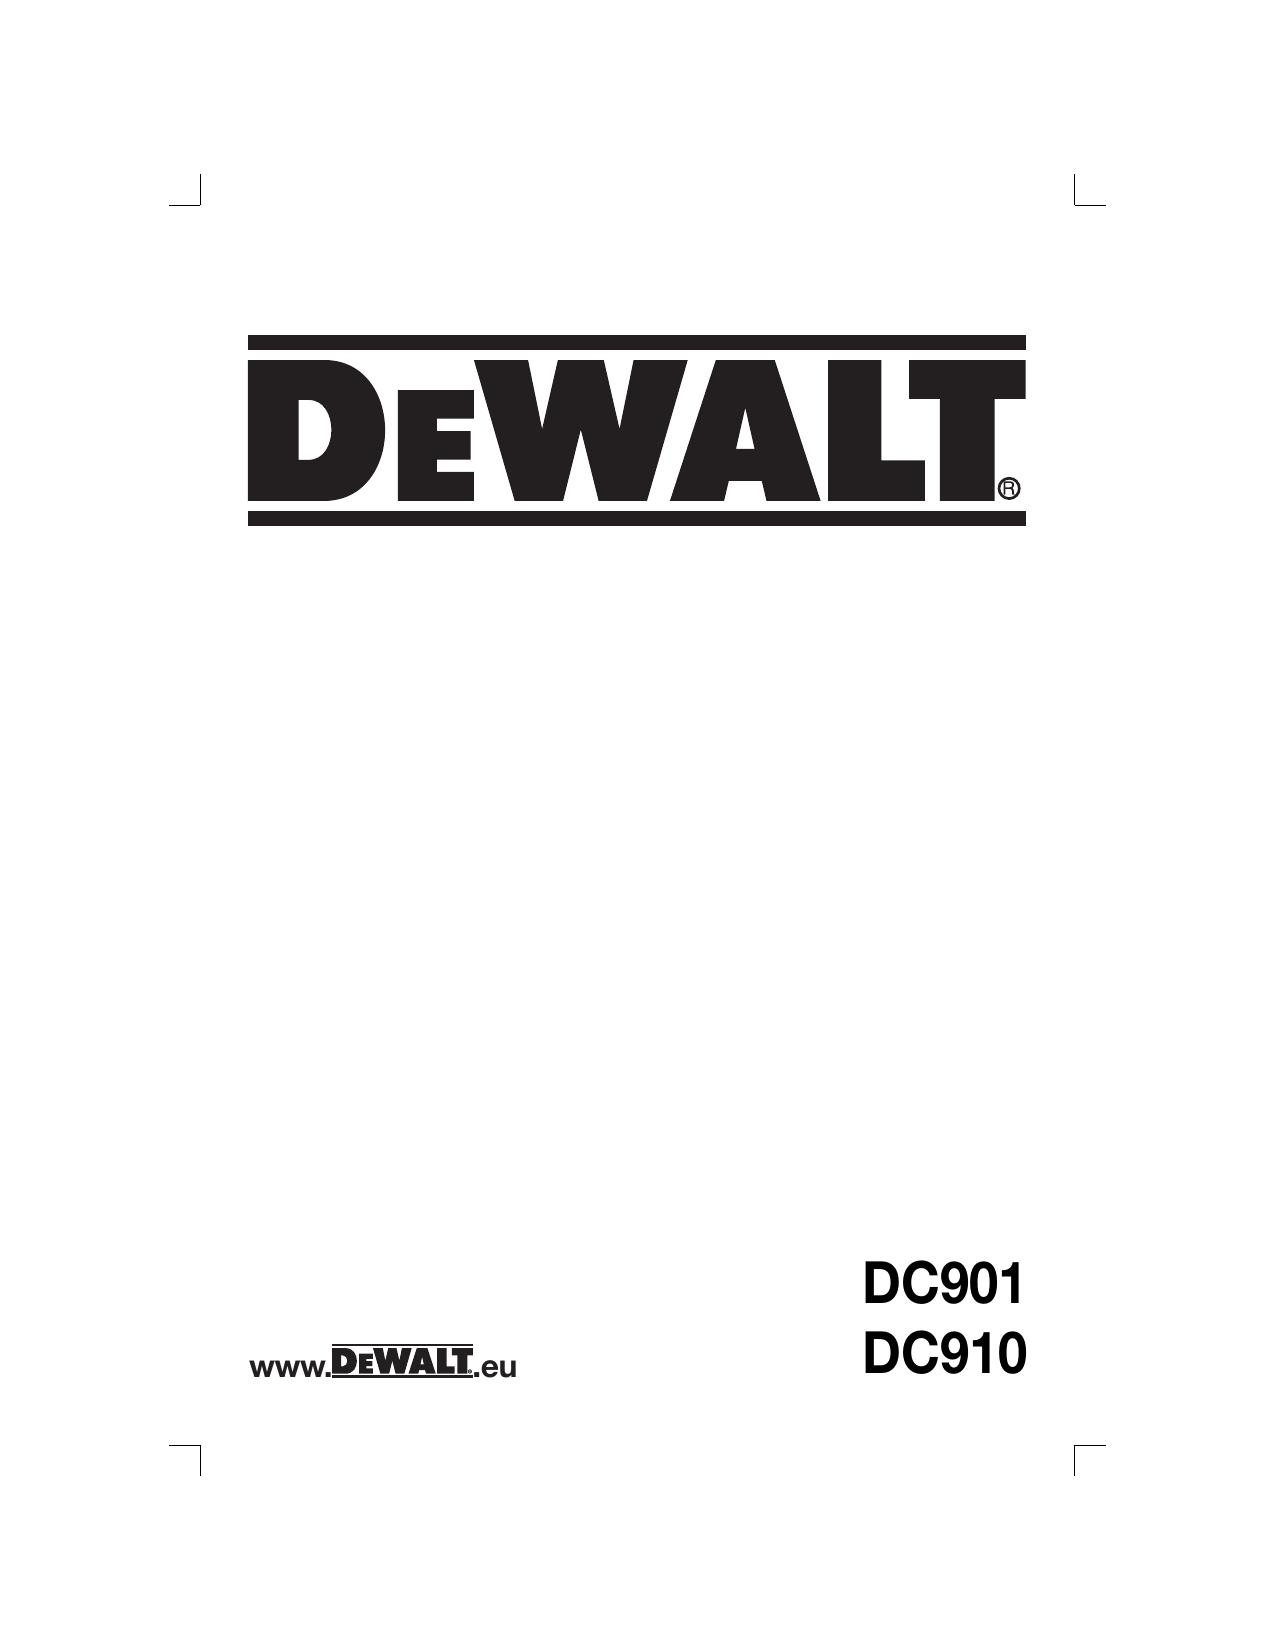 DeWalt DC910KL CORDLESS DRILL instruction manual